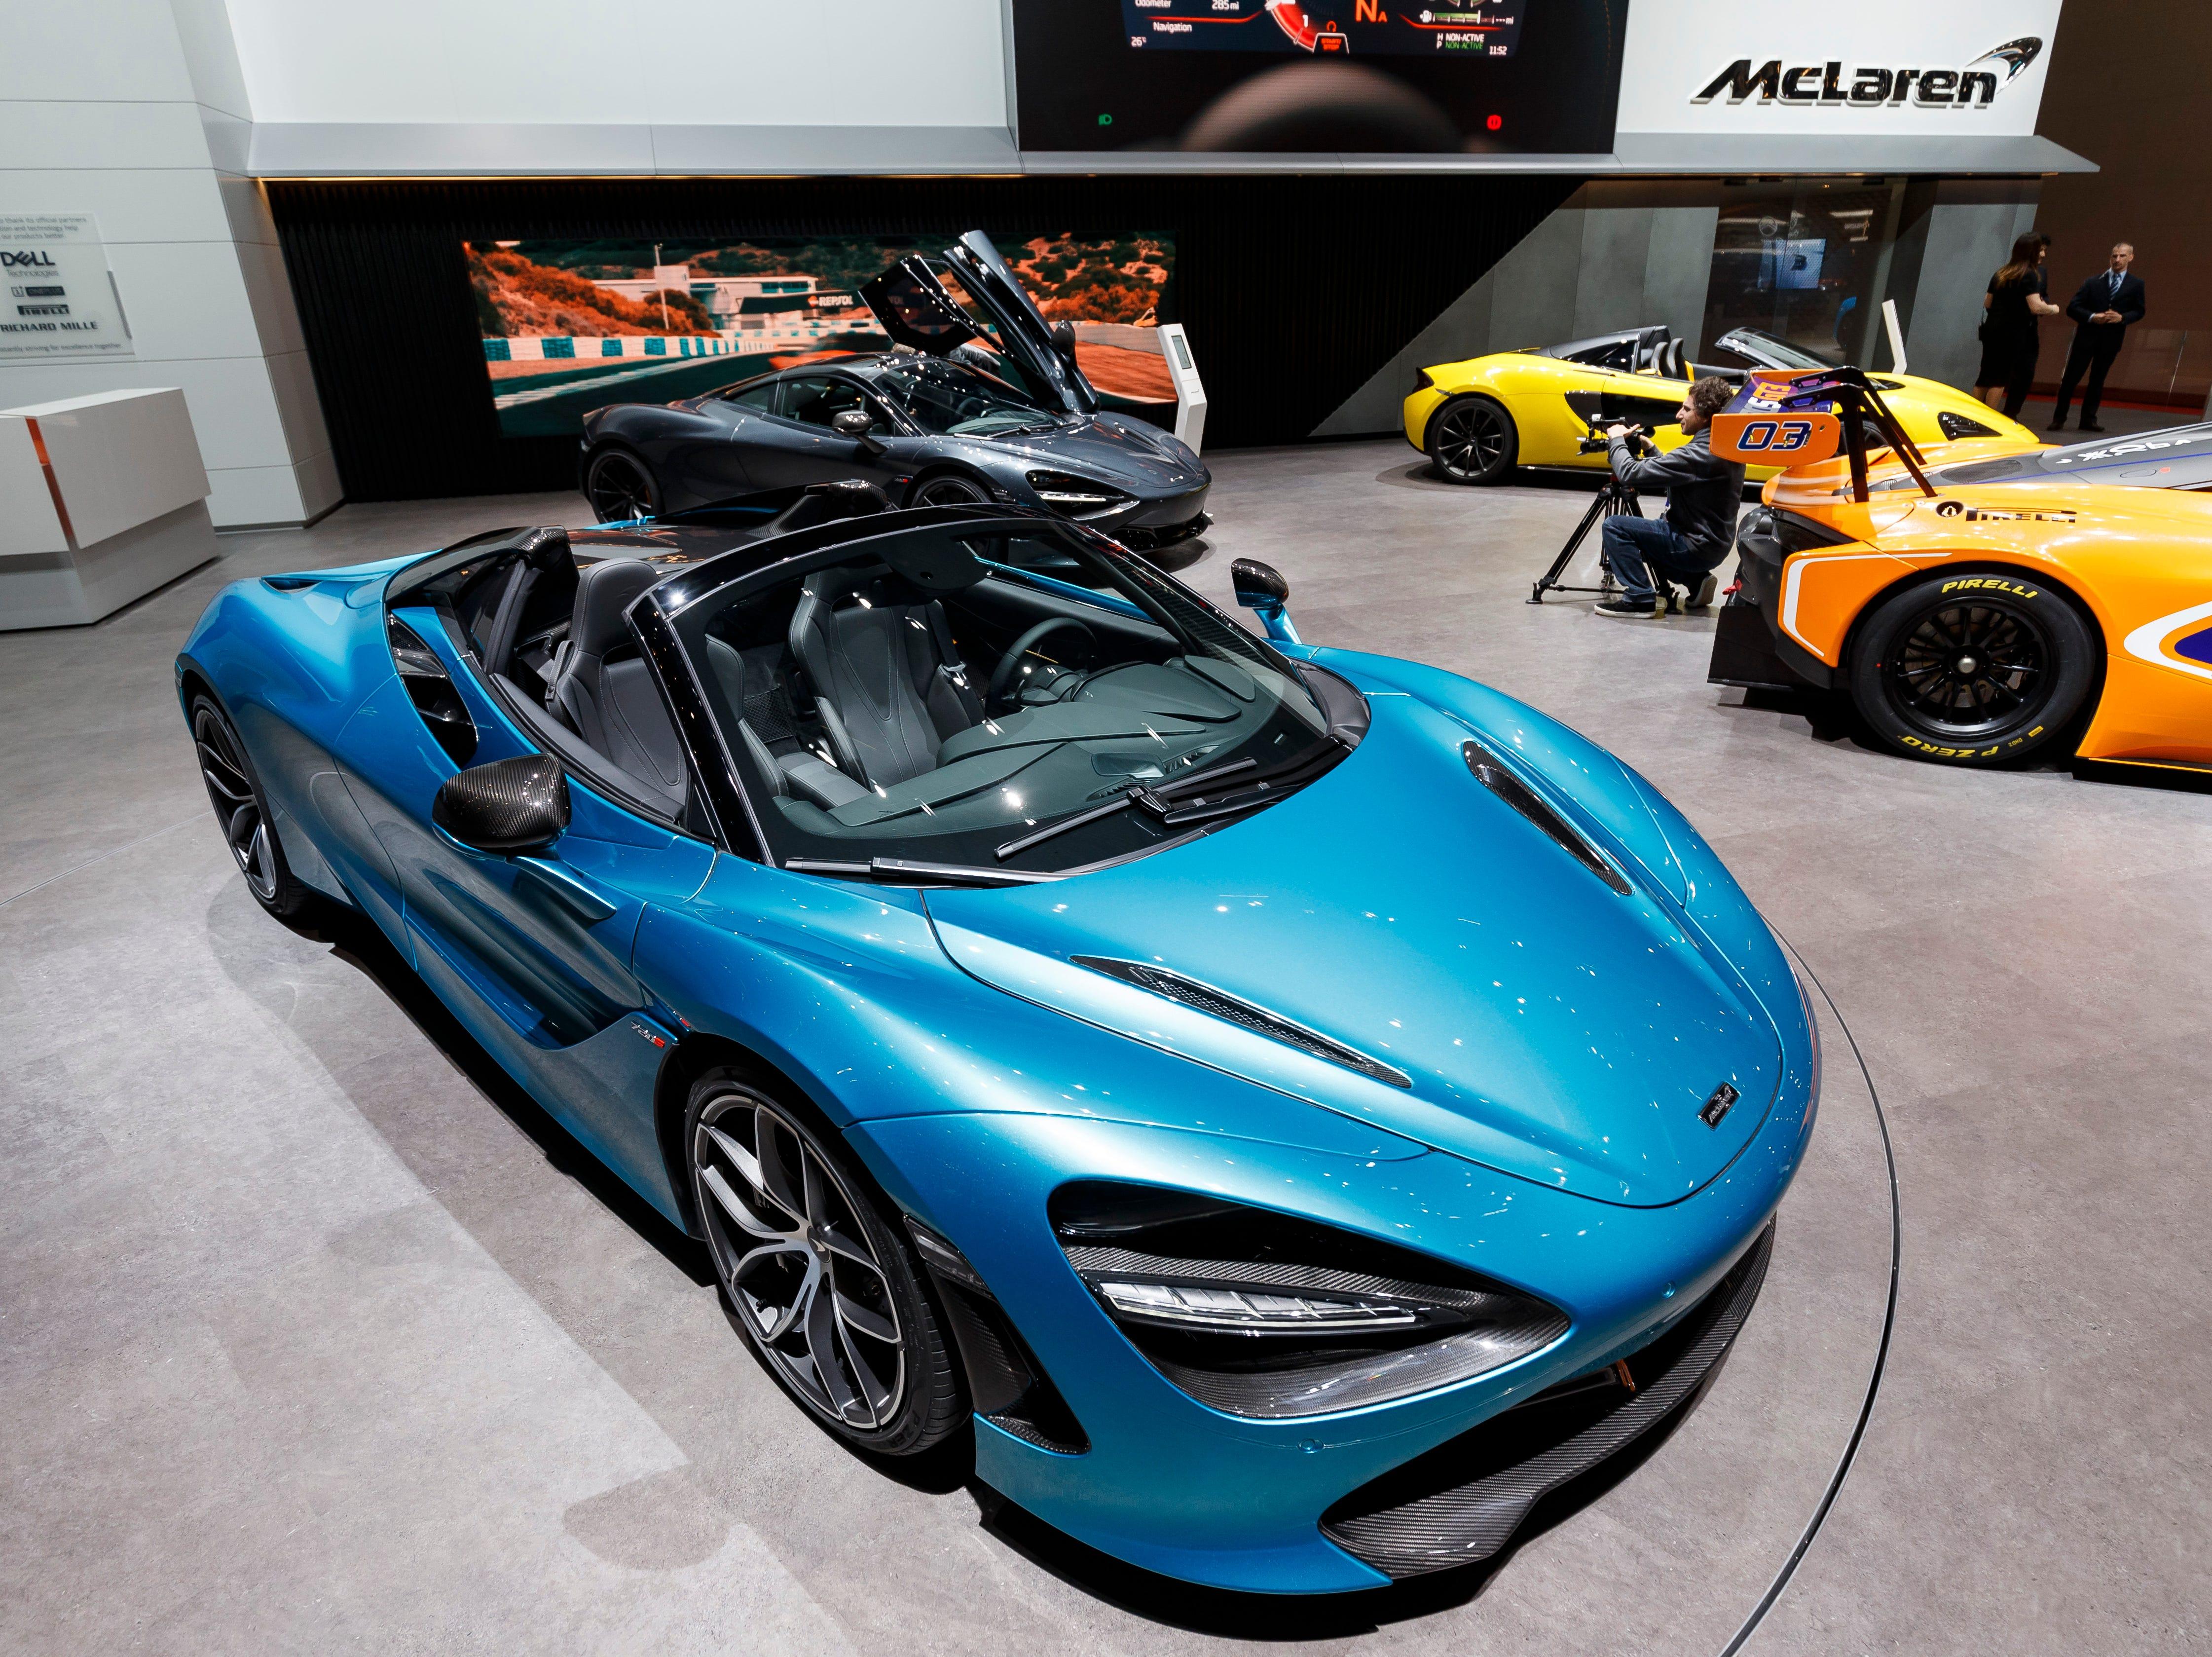 The McLaren 720s Spider